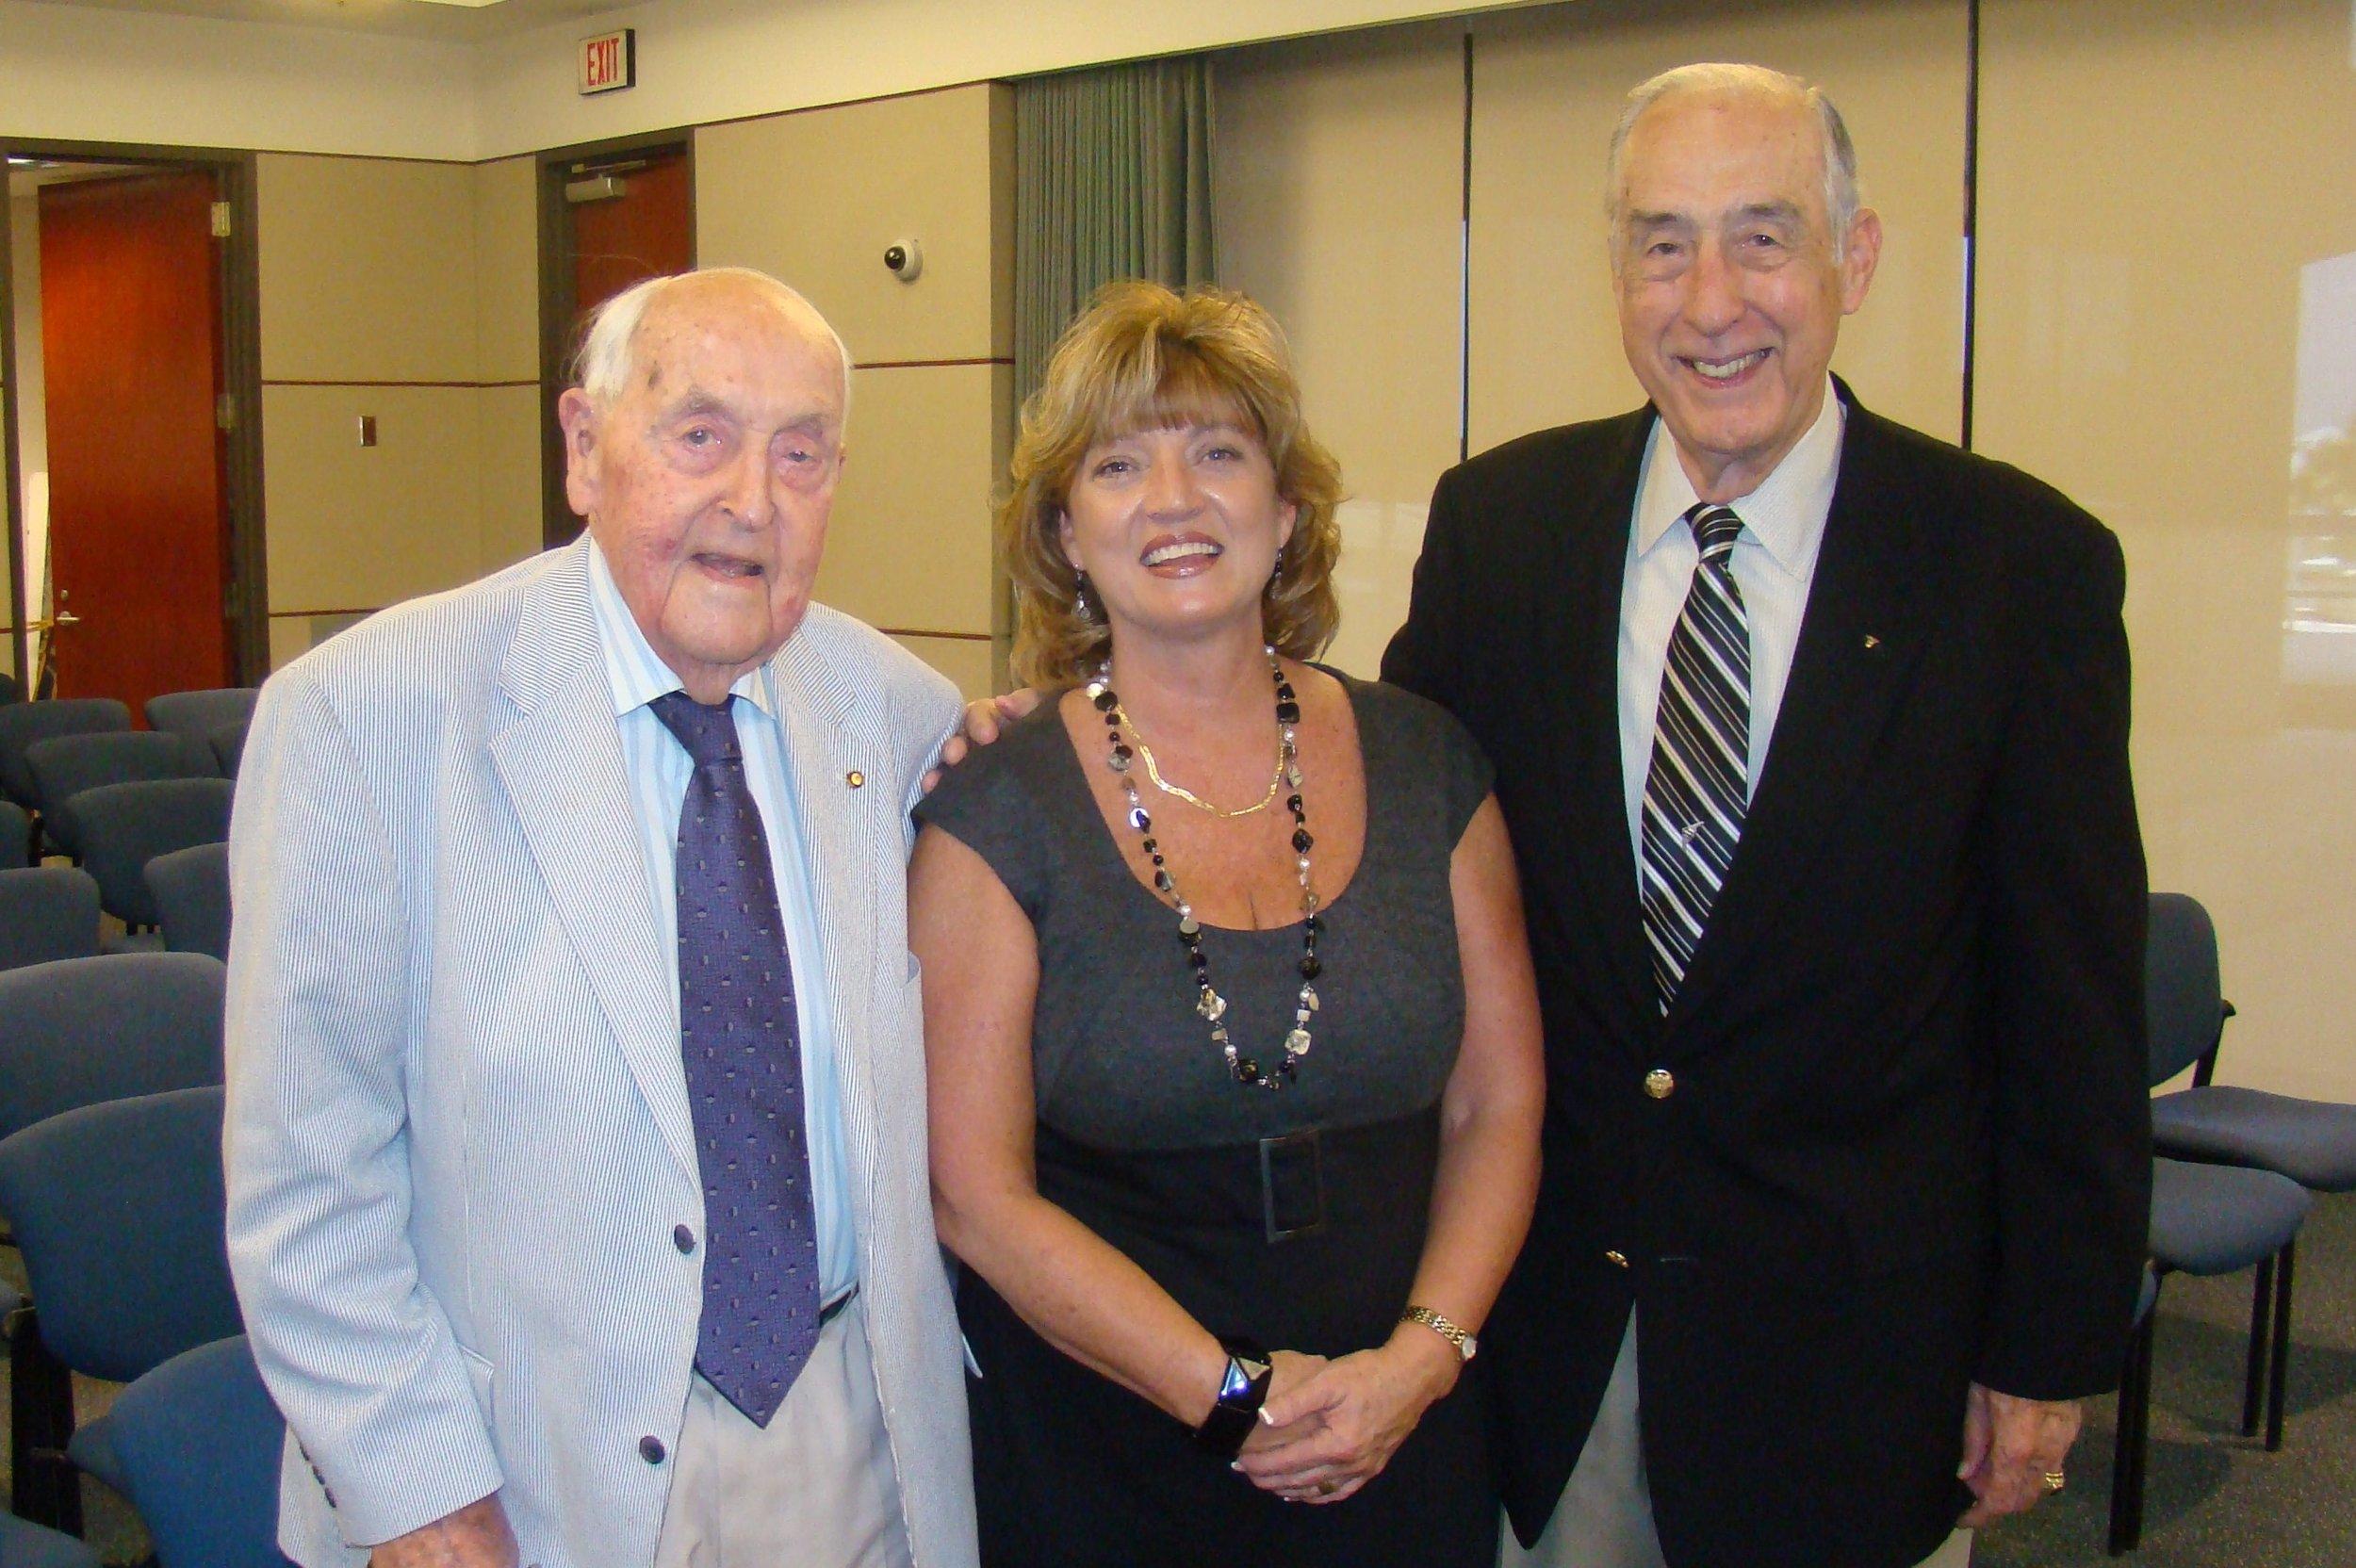 Sir Lenox, Colleen Picard & Dick Newton - 2, 27 Oct '11 - Copy (2).JPG